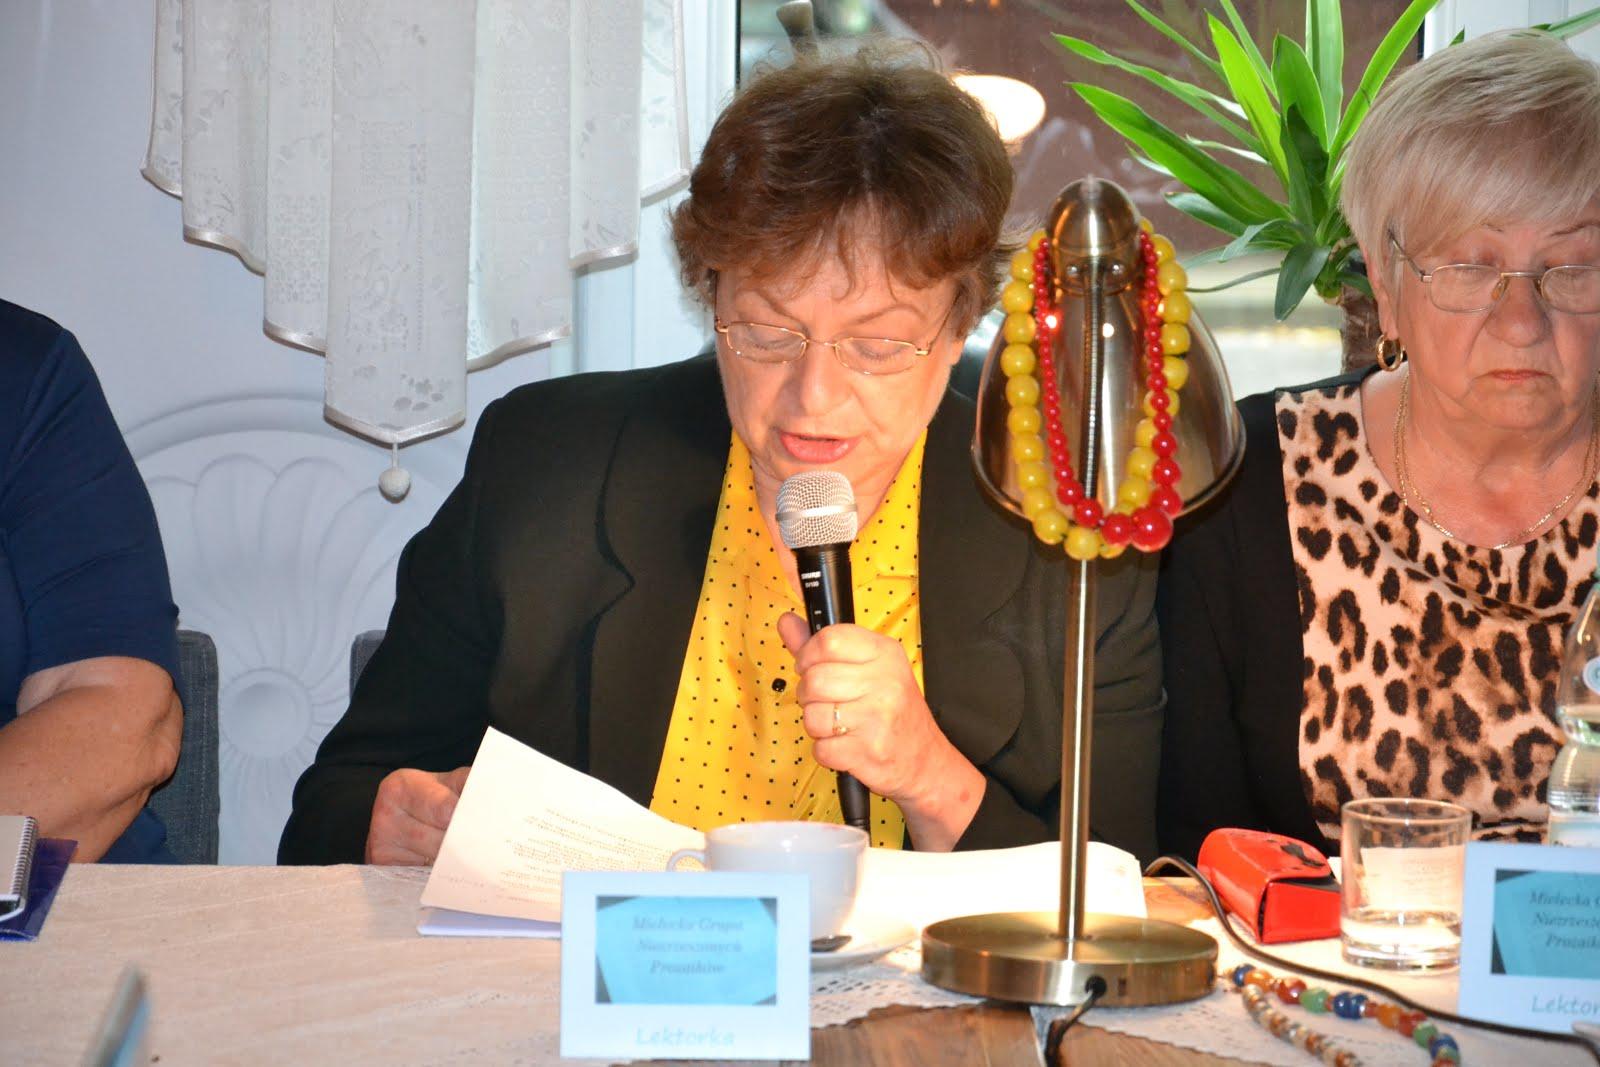 Maryla Karaś